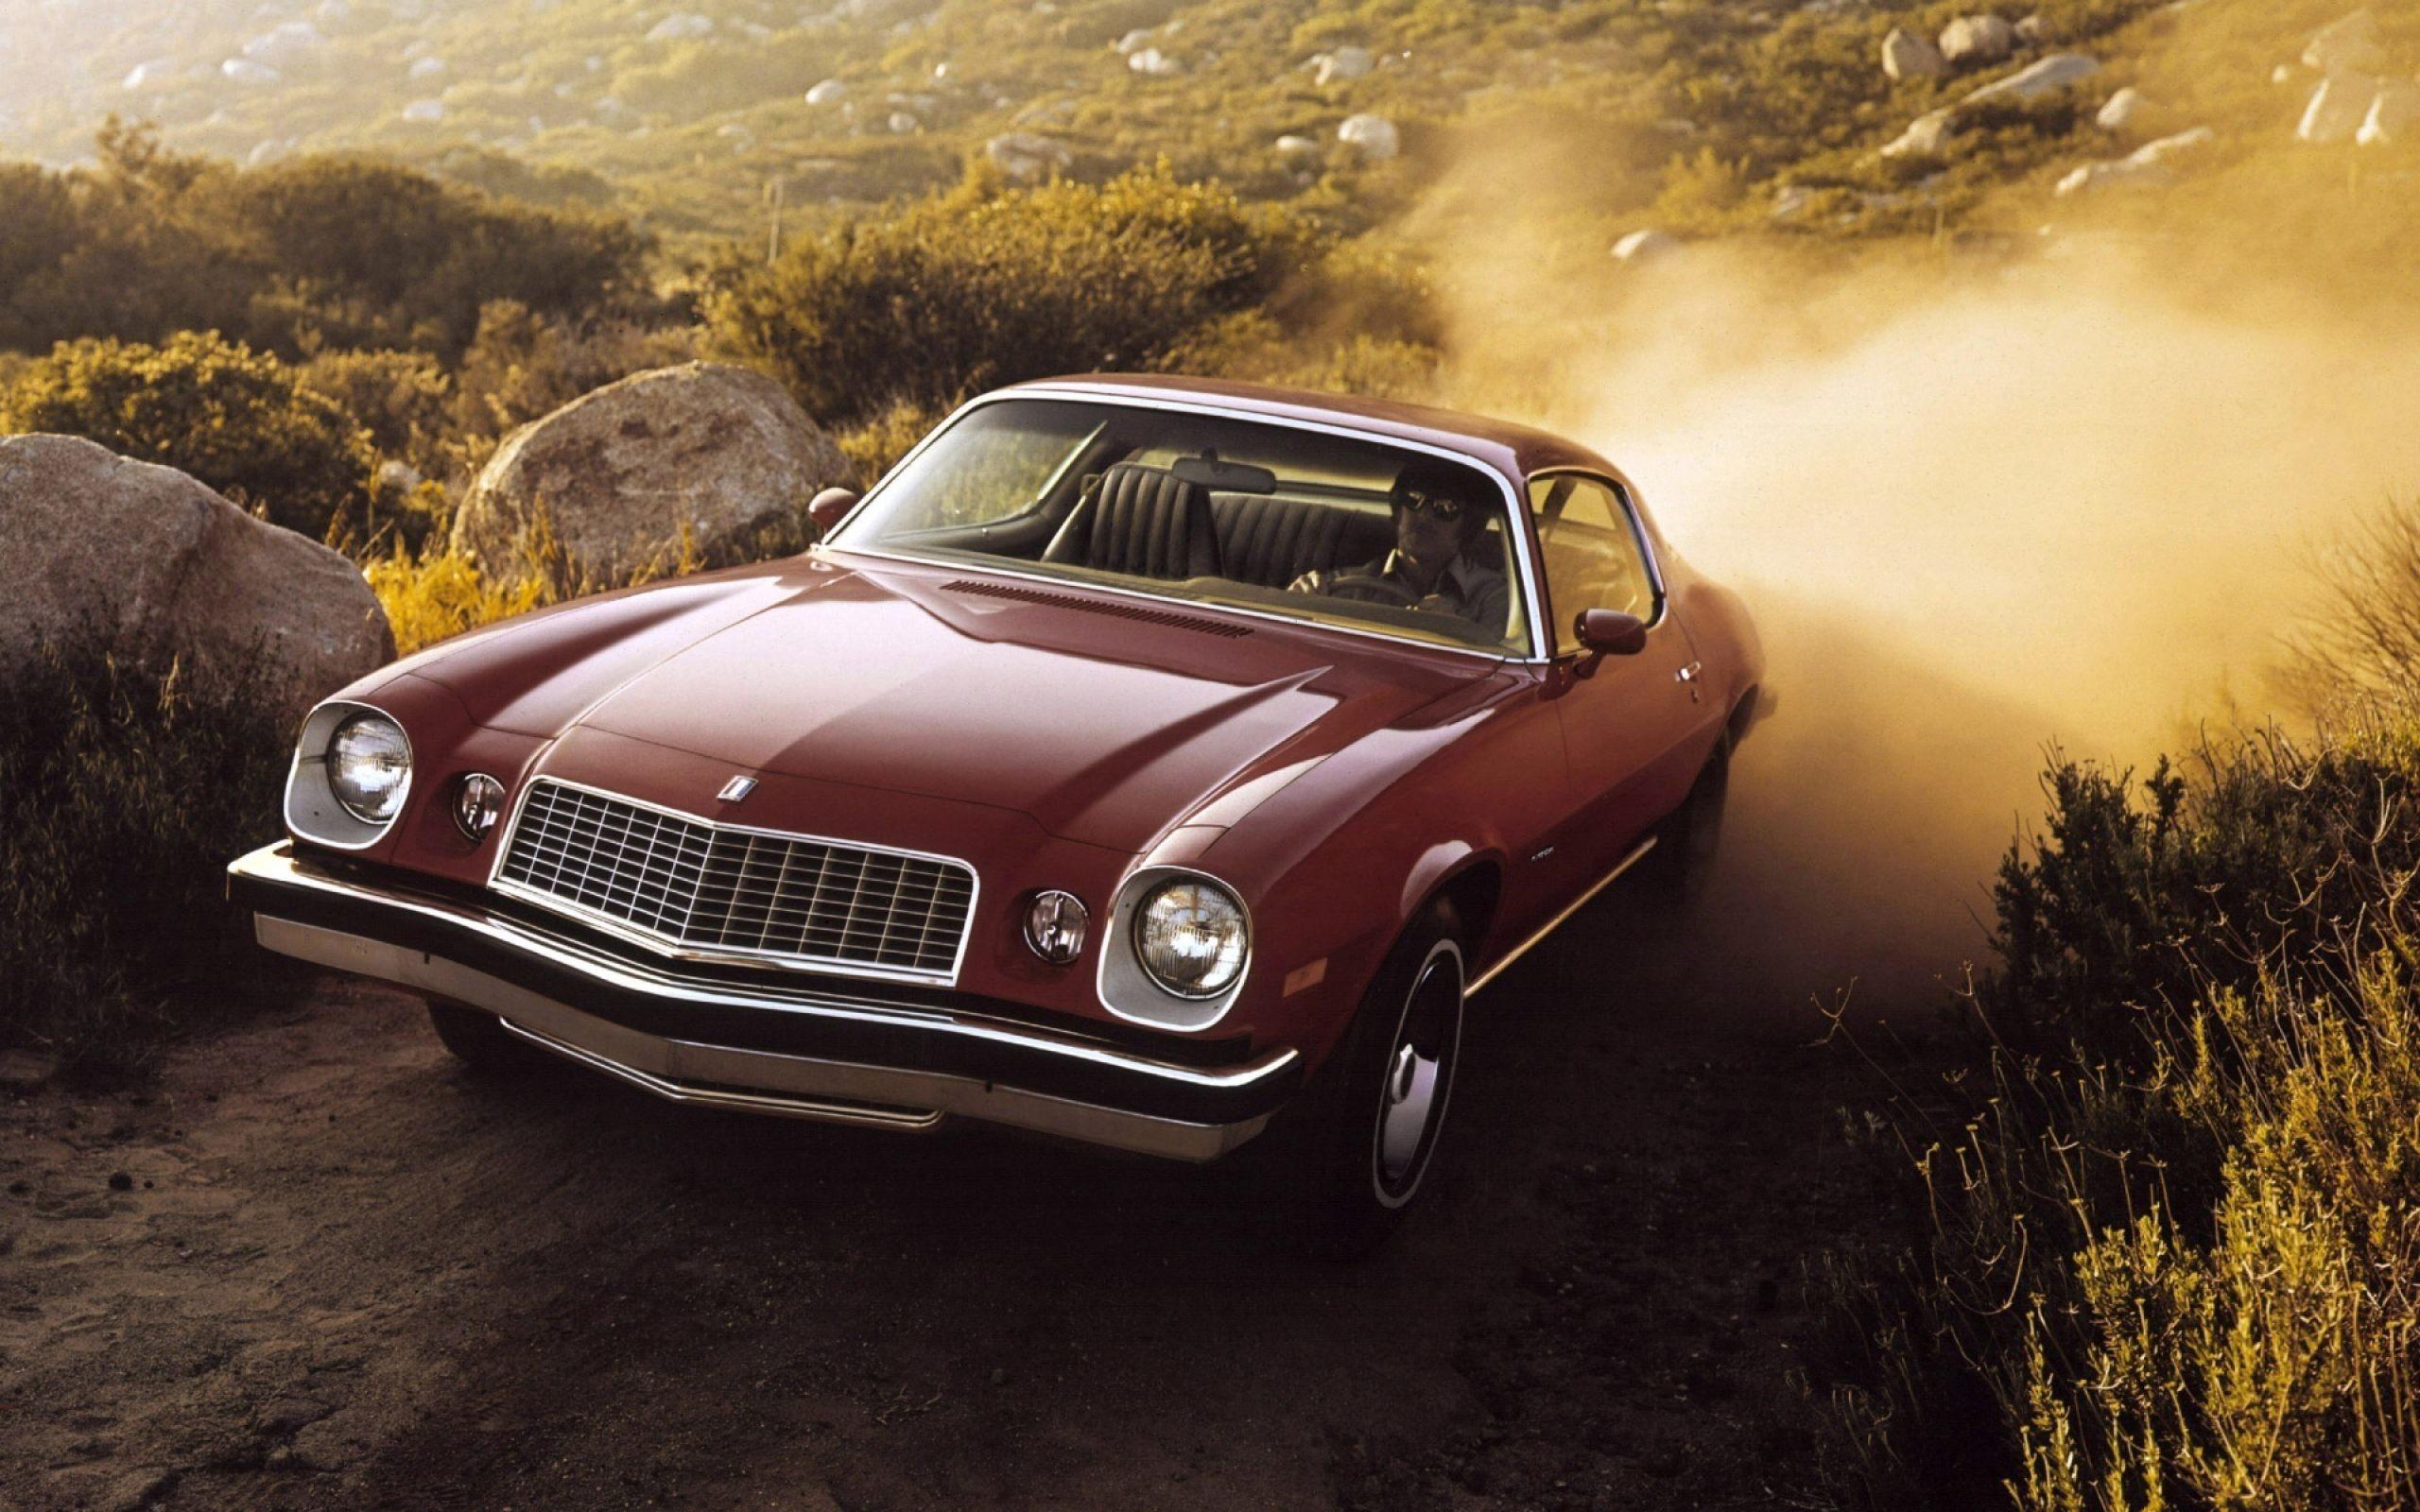 … 1976 chevy camaro clic car wallpaper hd of old car; 1969 chevrolet  camaro …